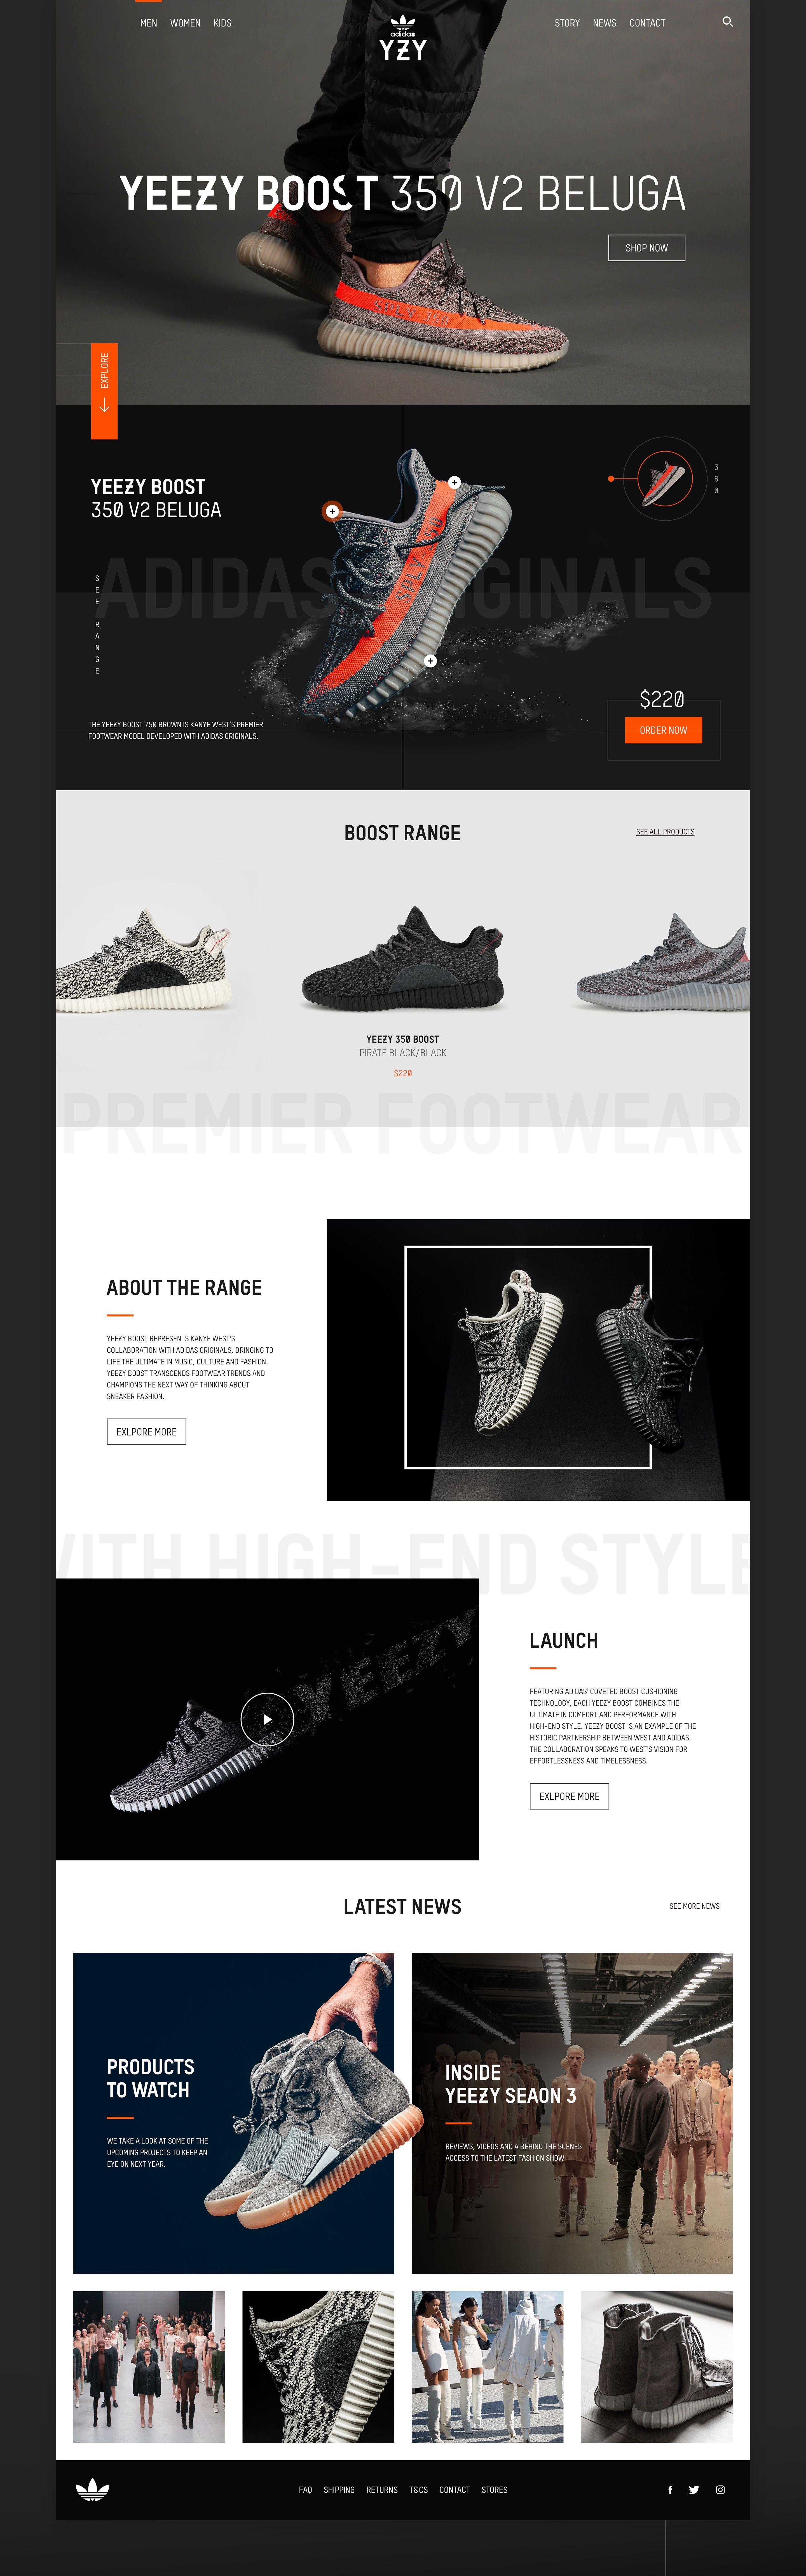 Adidas Yeezy Boost Concept on Behance